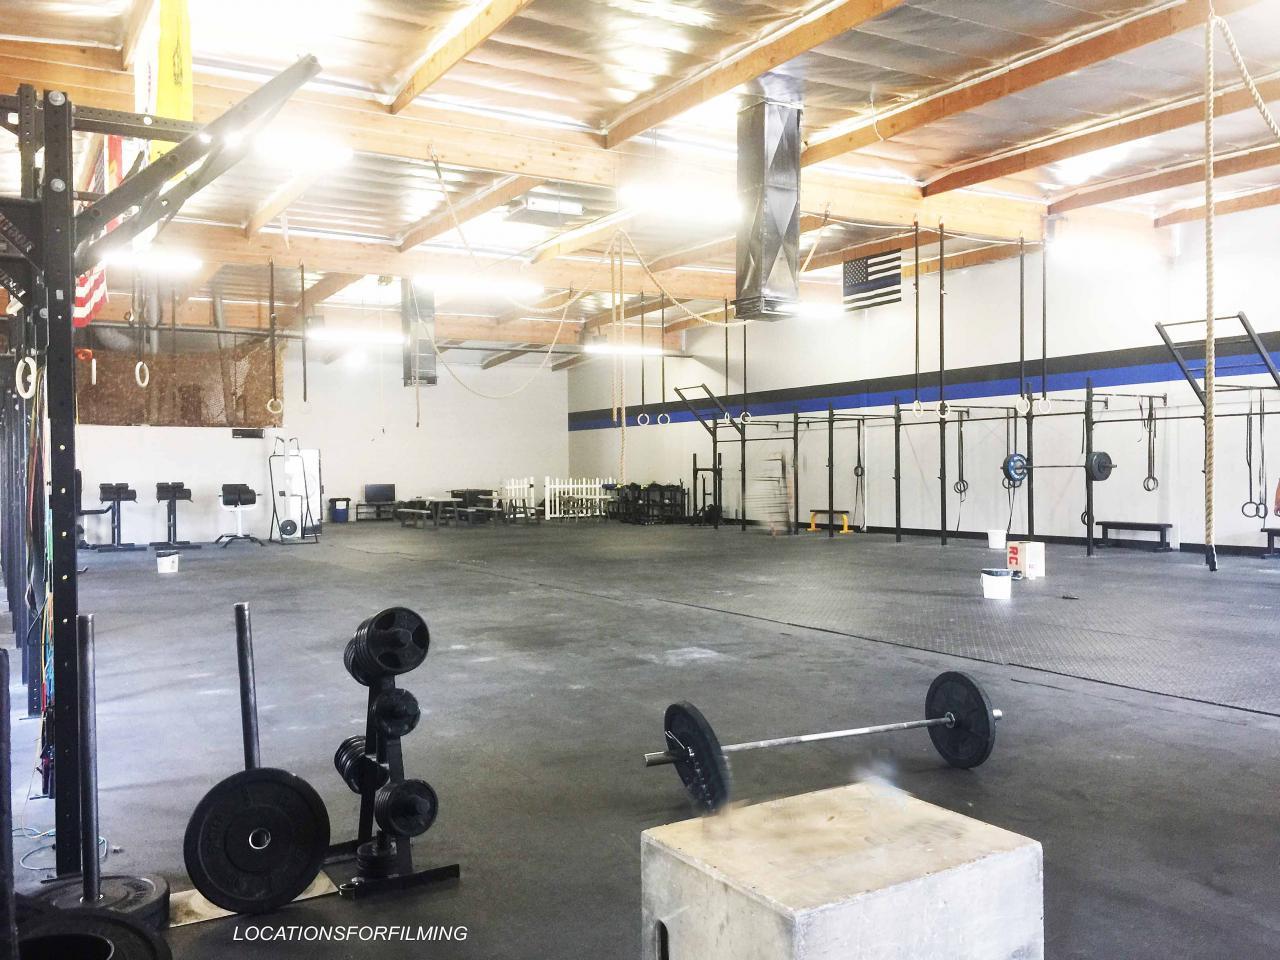 EB - Gym